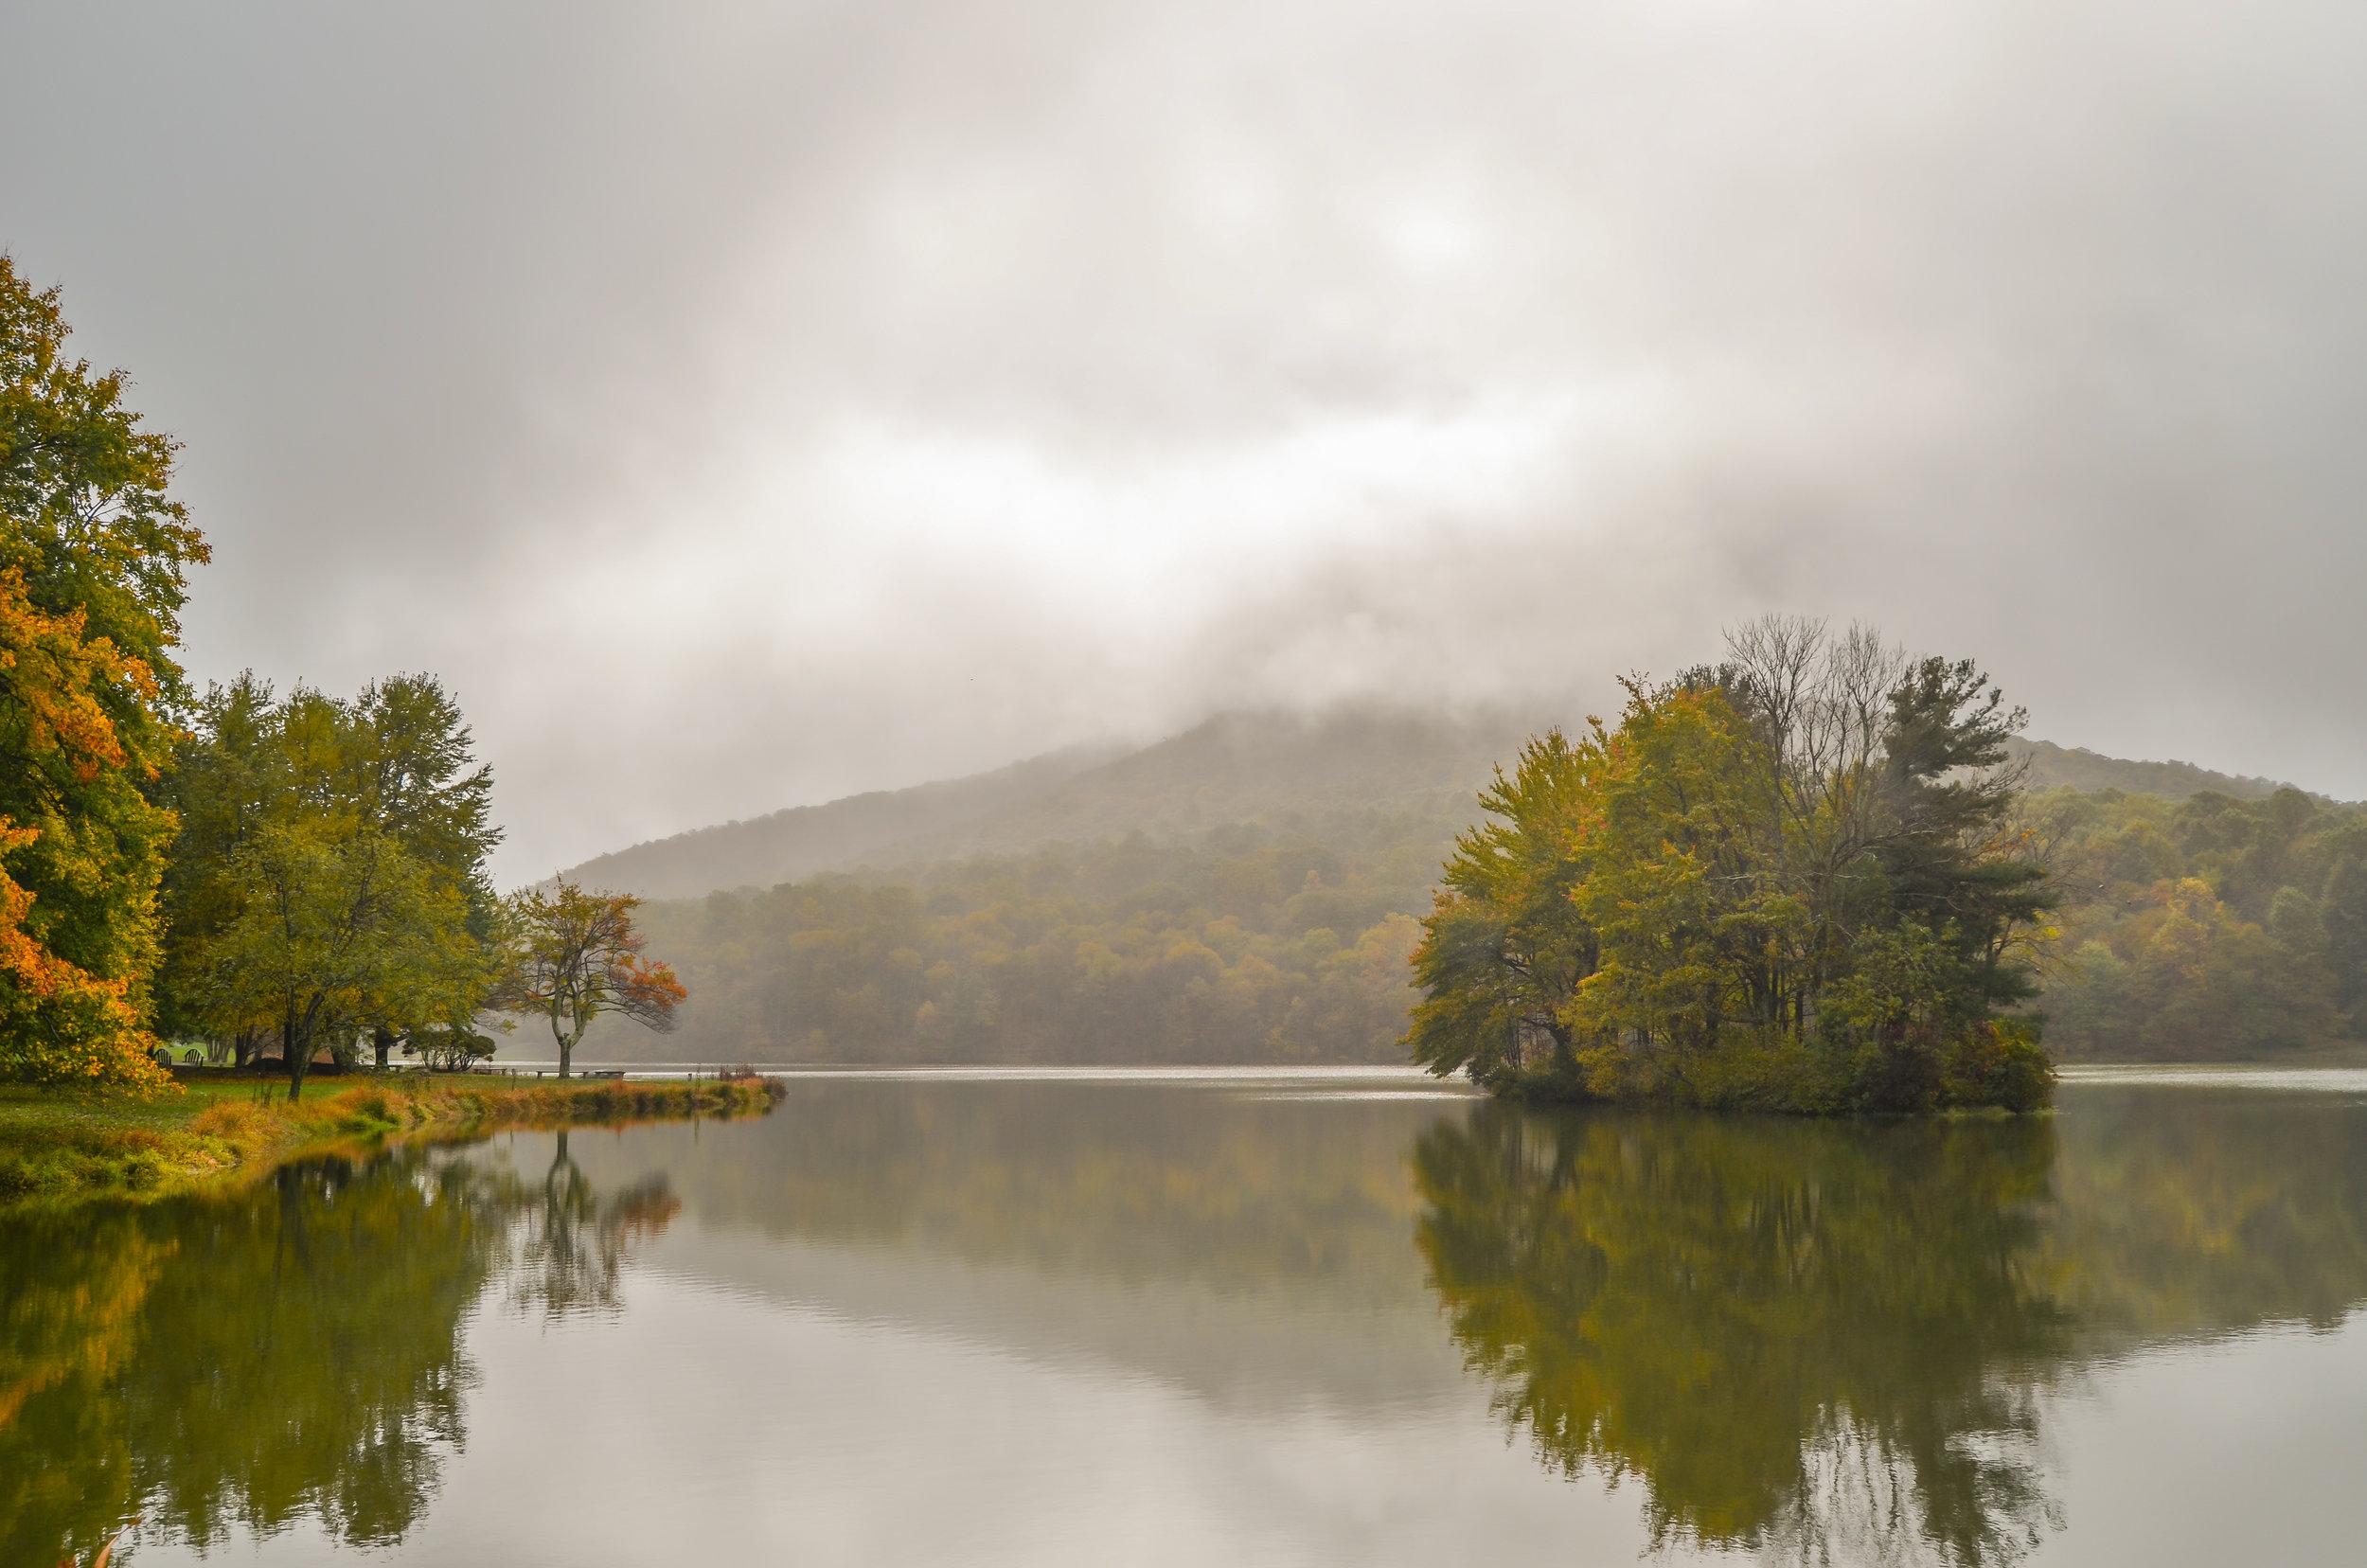 sharptop mountain-peaks of otter-lake abbott-otter crek falls-blue ridge parkway-fall-autumn-virginia.jpg